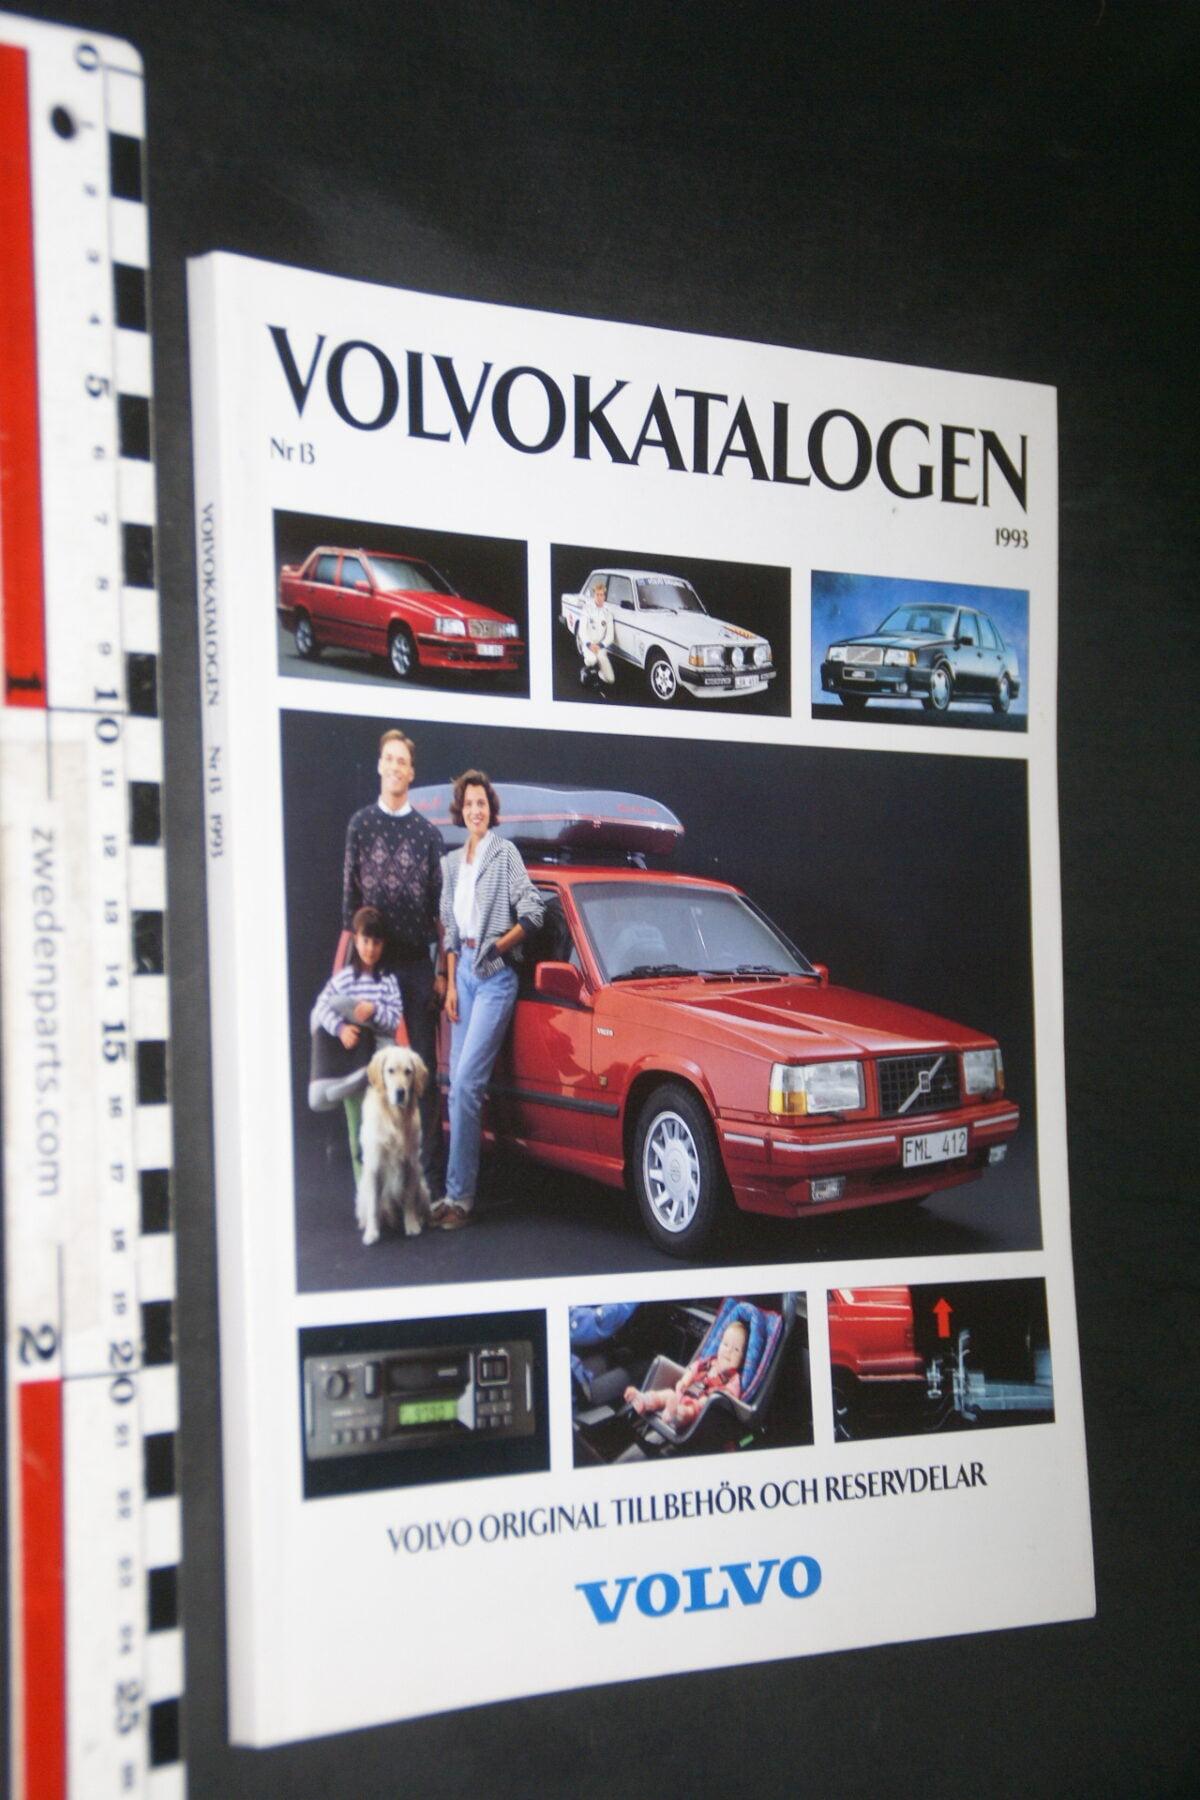 DSC03316 1993 origineel boek Volvo Katalogen accessoires nr VBE 4713-5ed69a3f